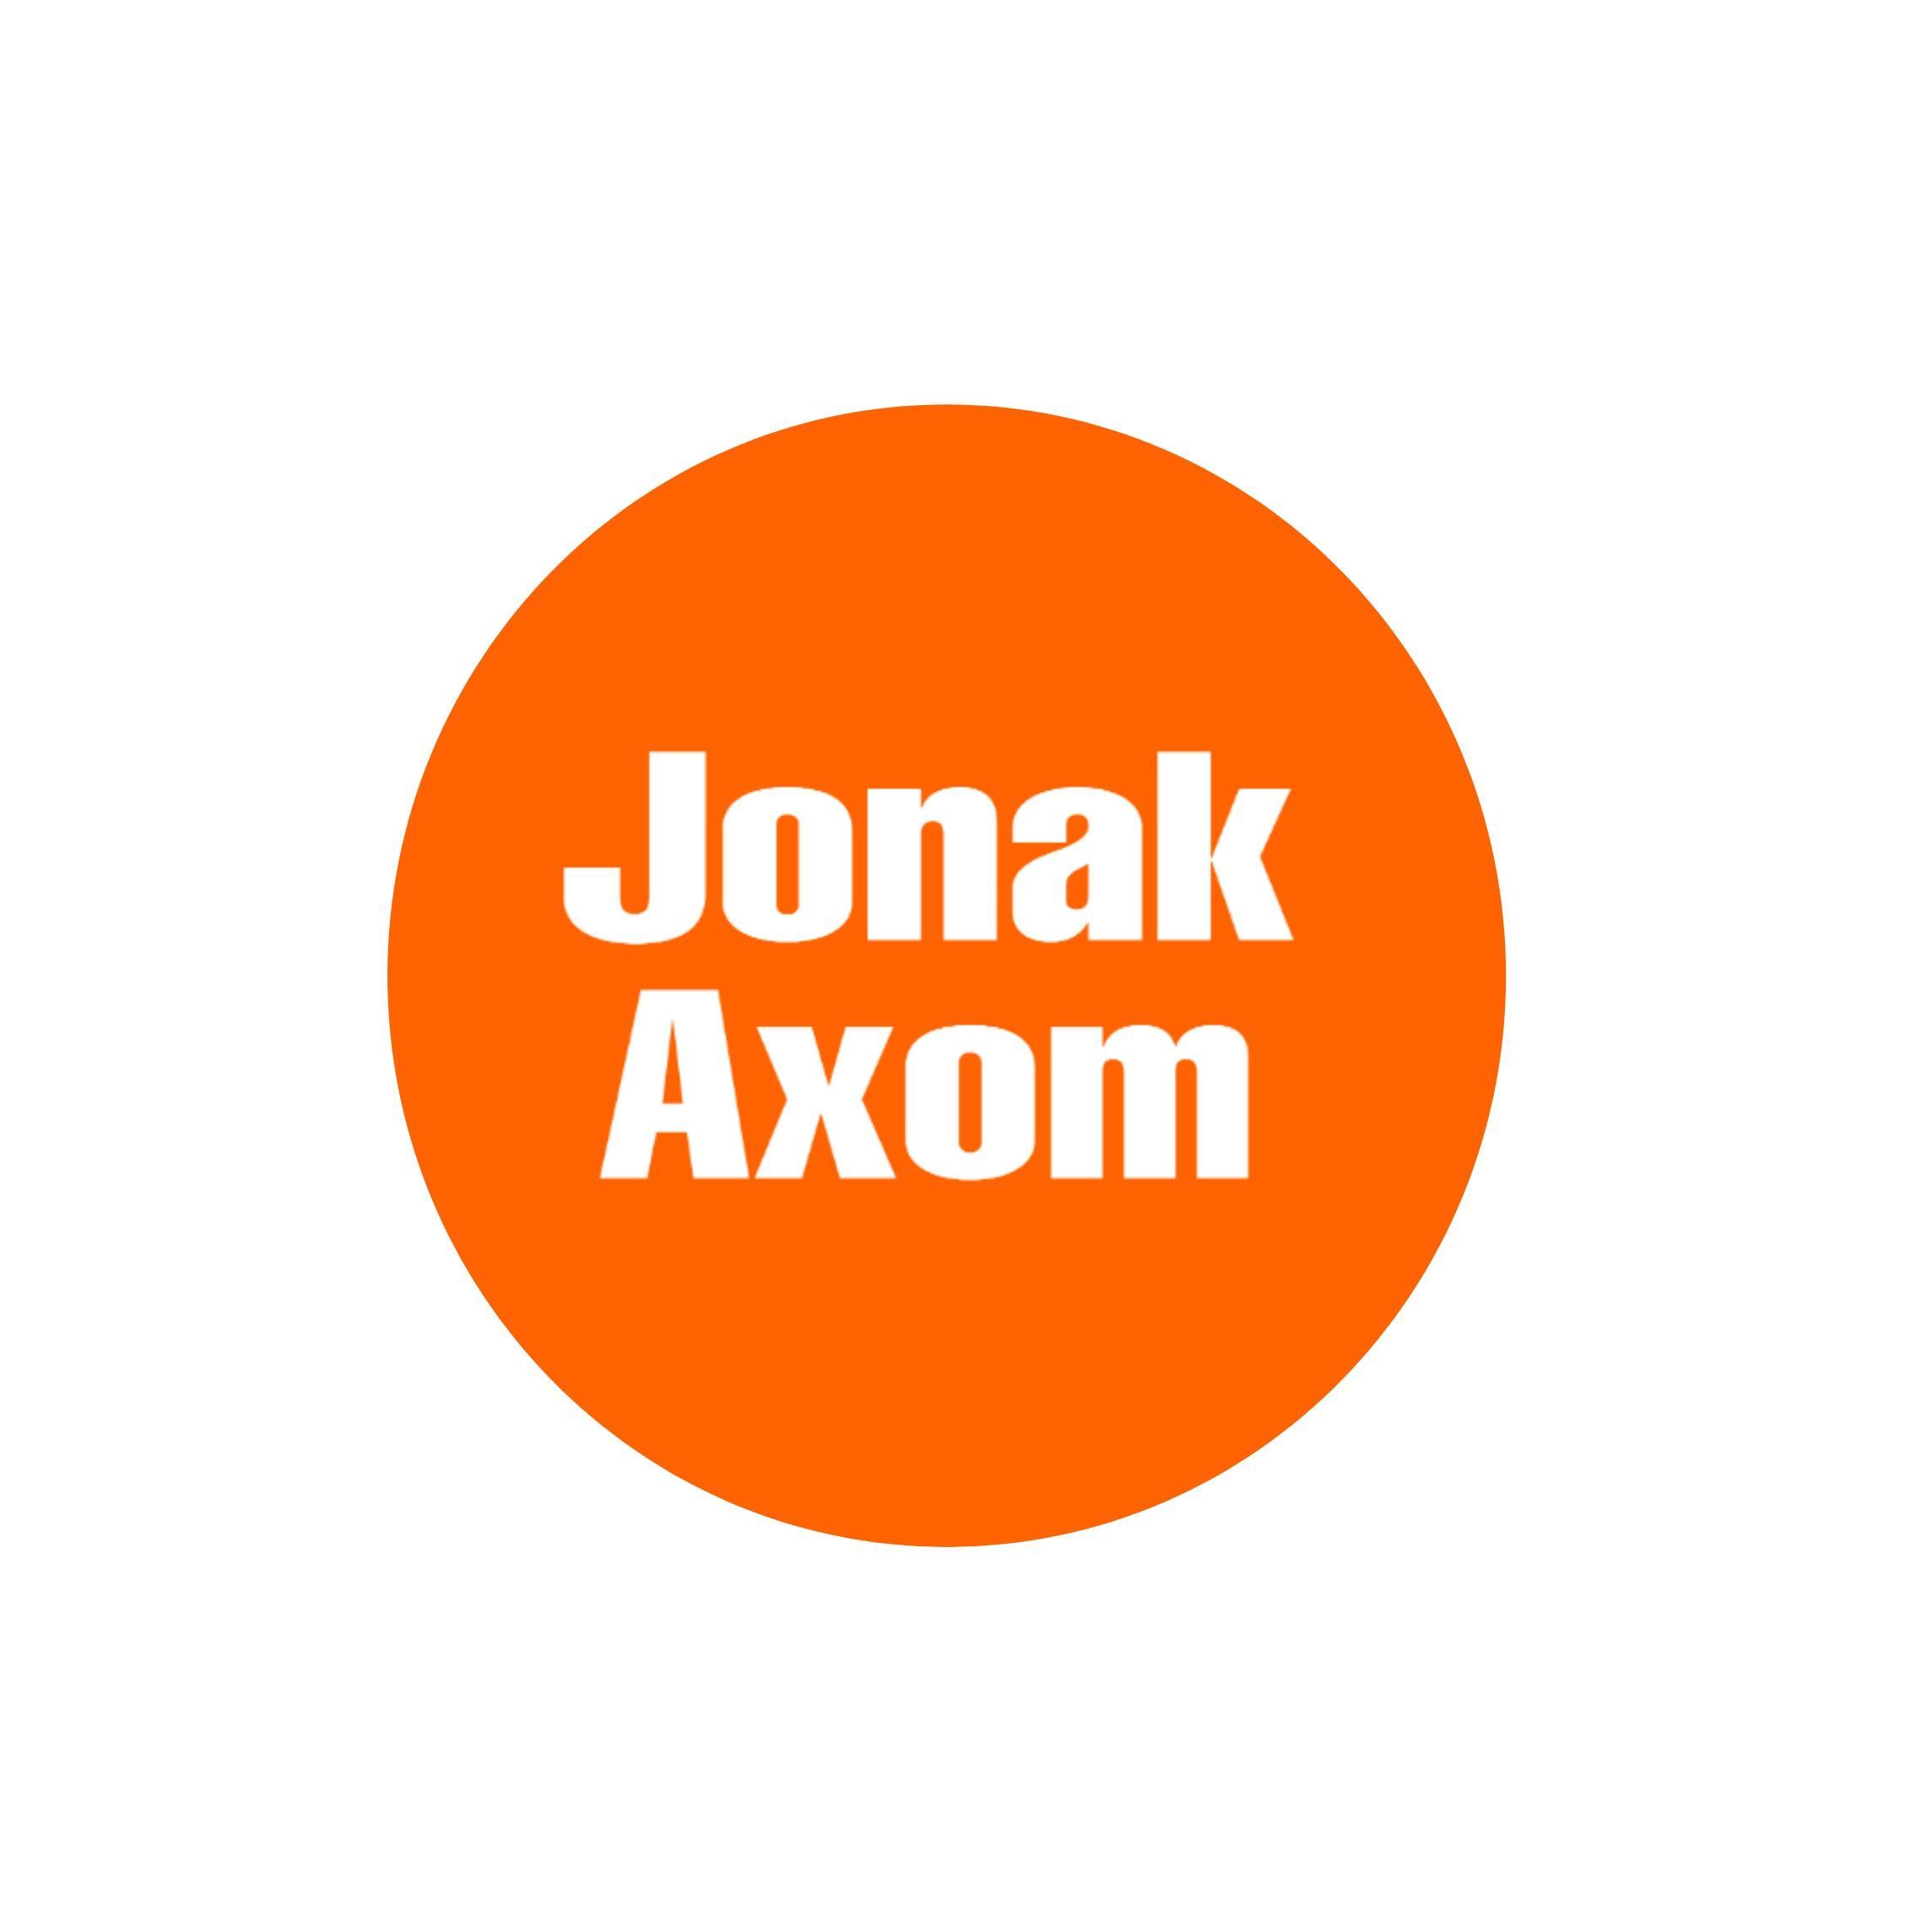 Avatar - Jonak axom